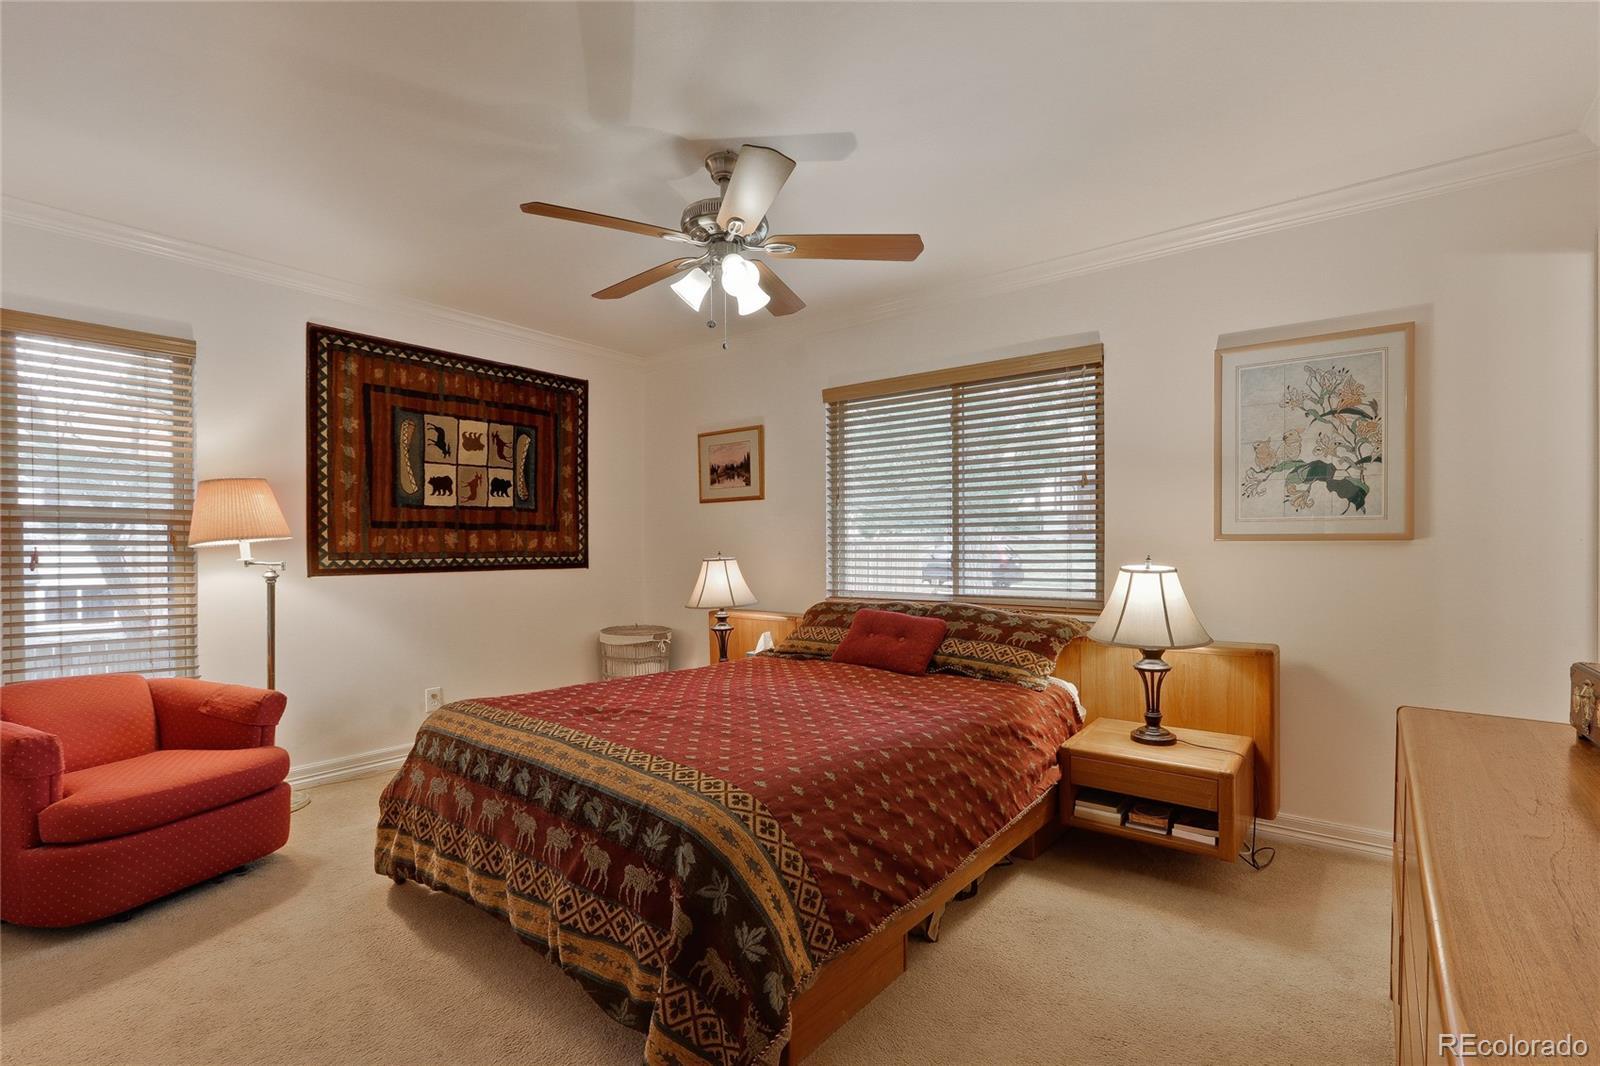 MLS# 6751608 - 12 - 12838 W Arizona Place, Lakewood, CO 80228